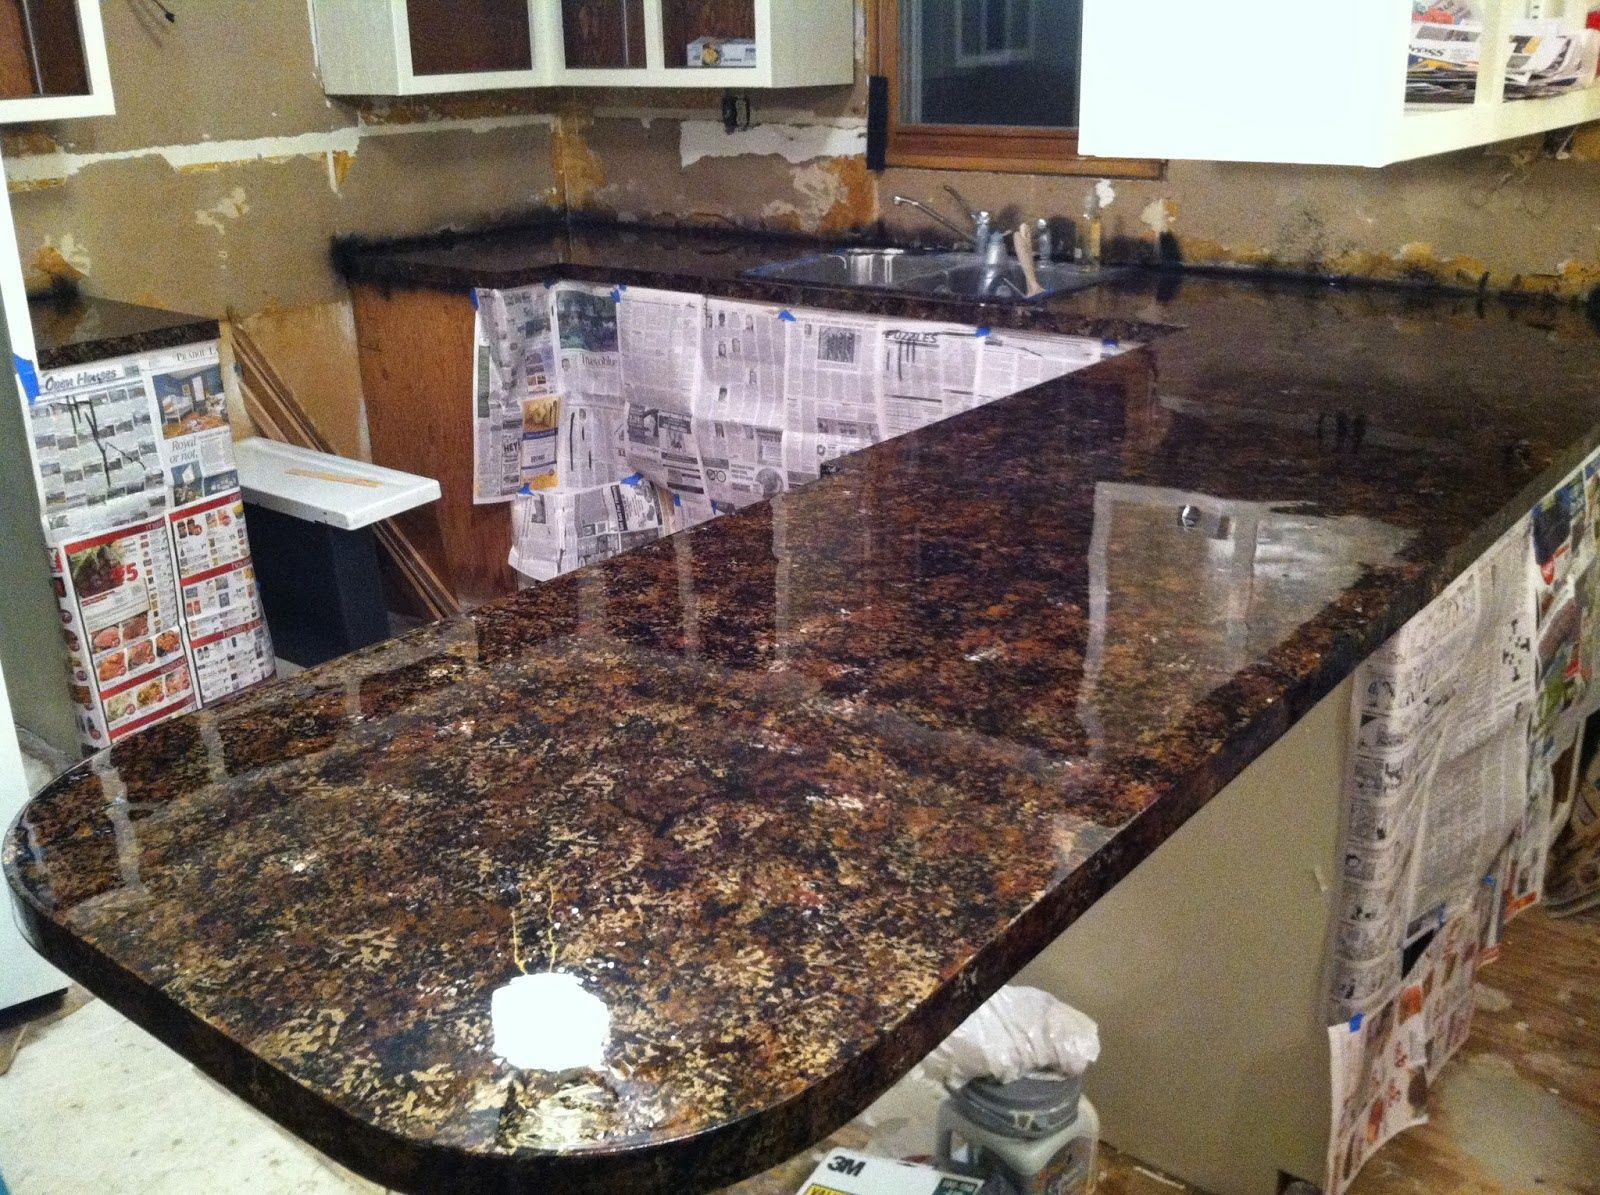 50 Granite Countertop Restoration Kitchen Island Countertop Ideas Check More At Http Mattinglybr Faux Granite Countertops Faux Granite Granite Countertops